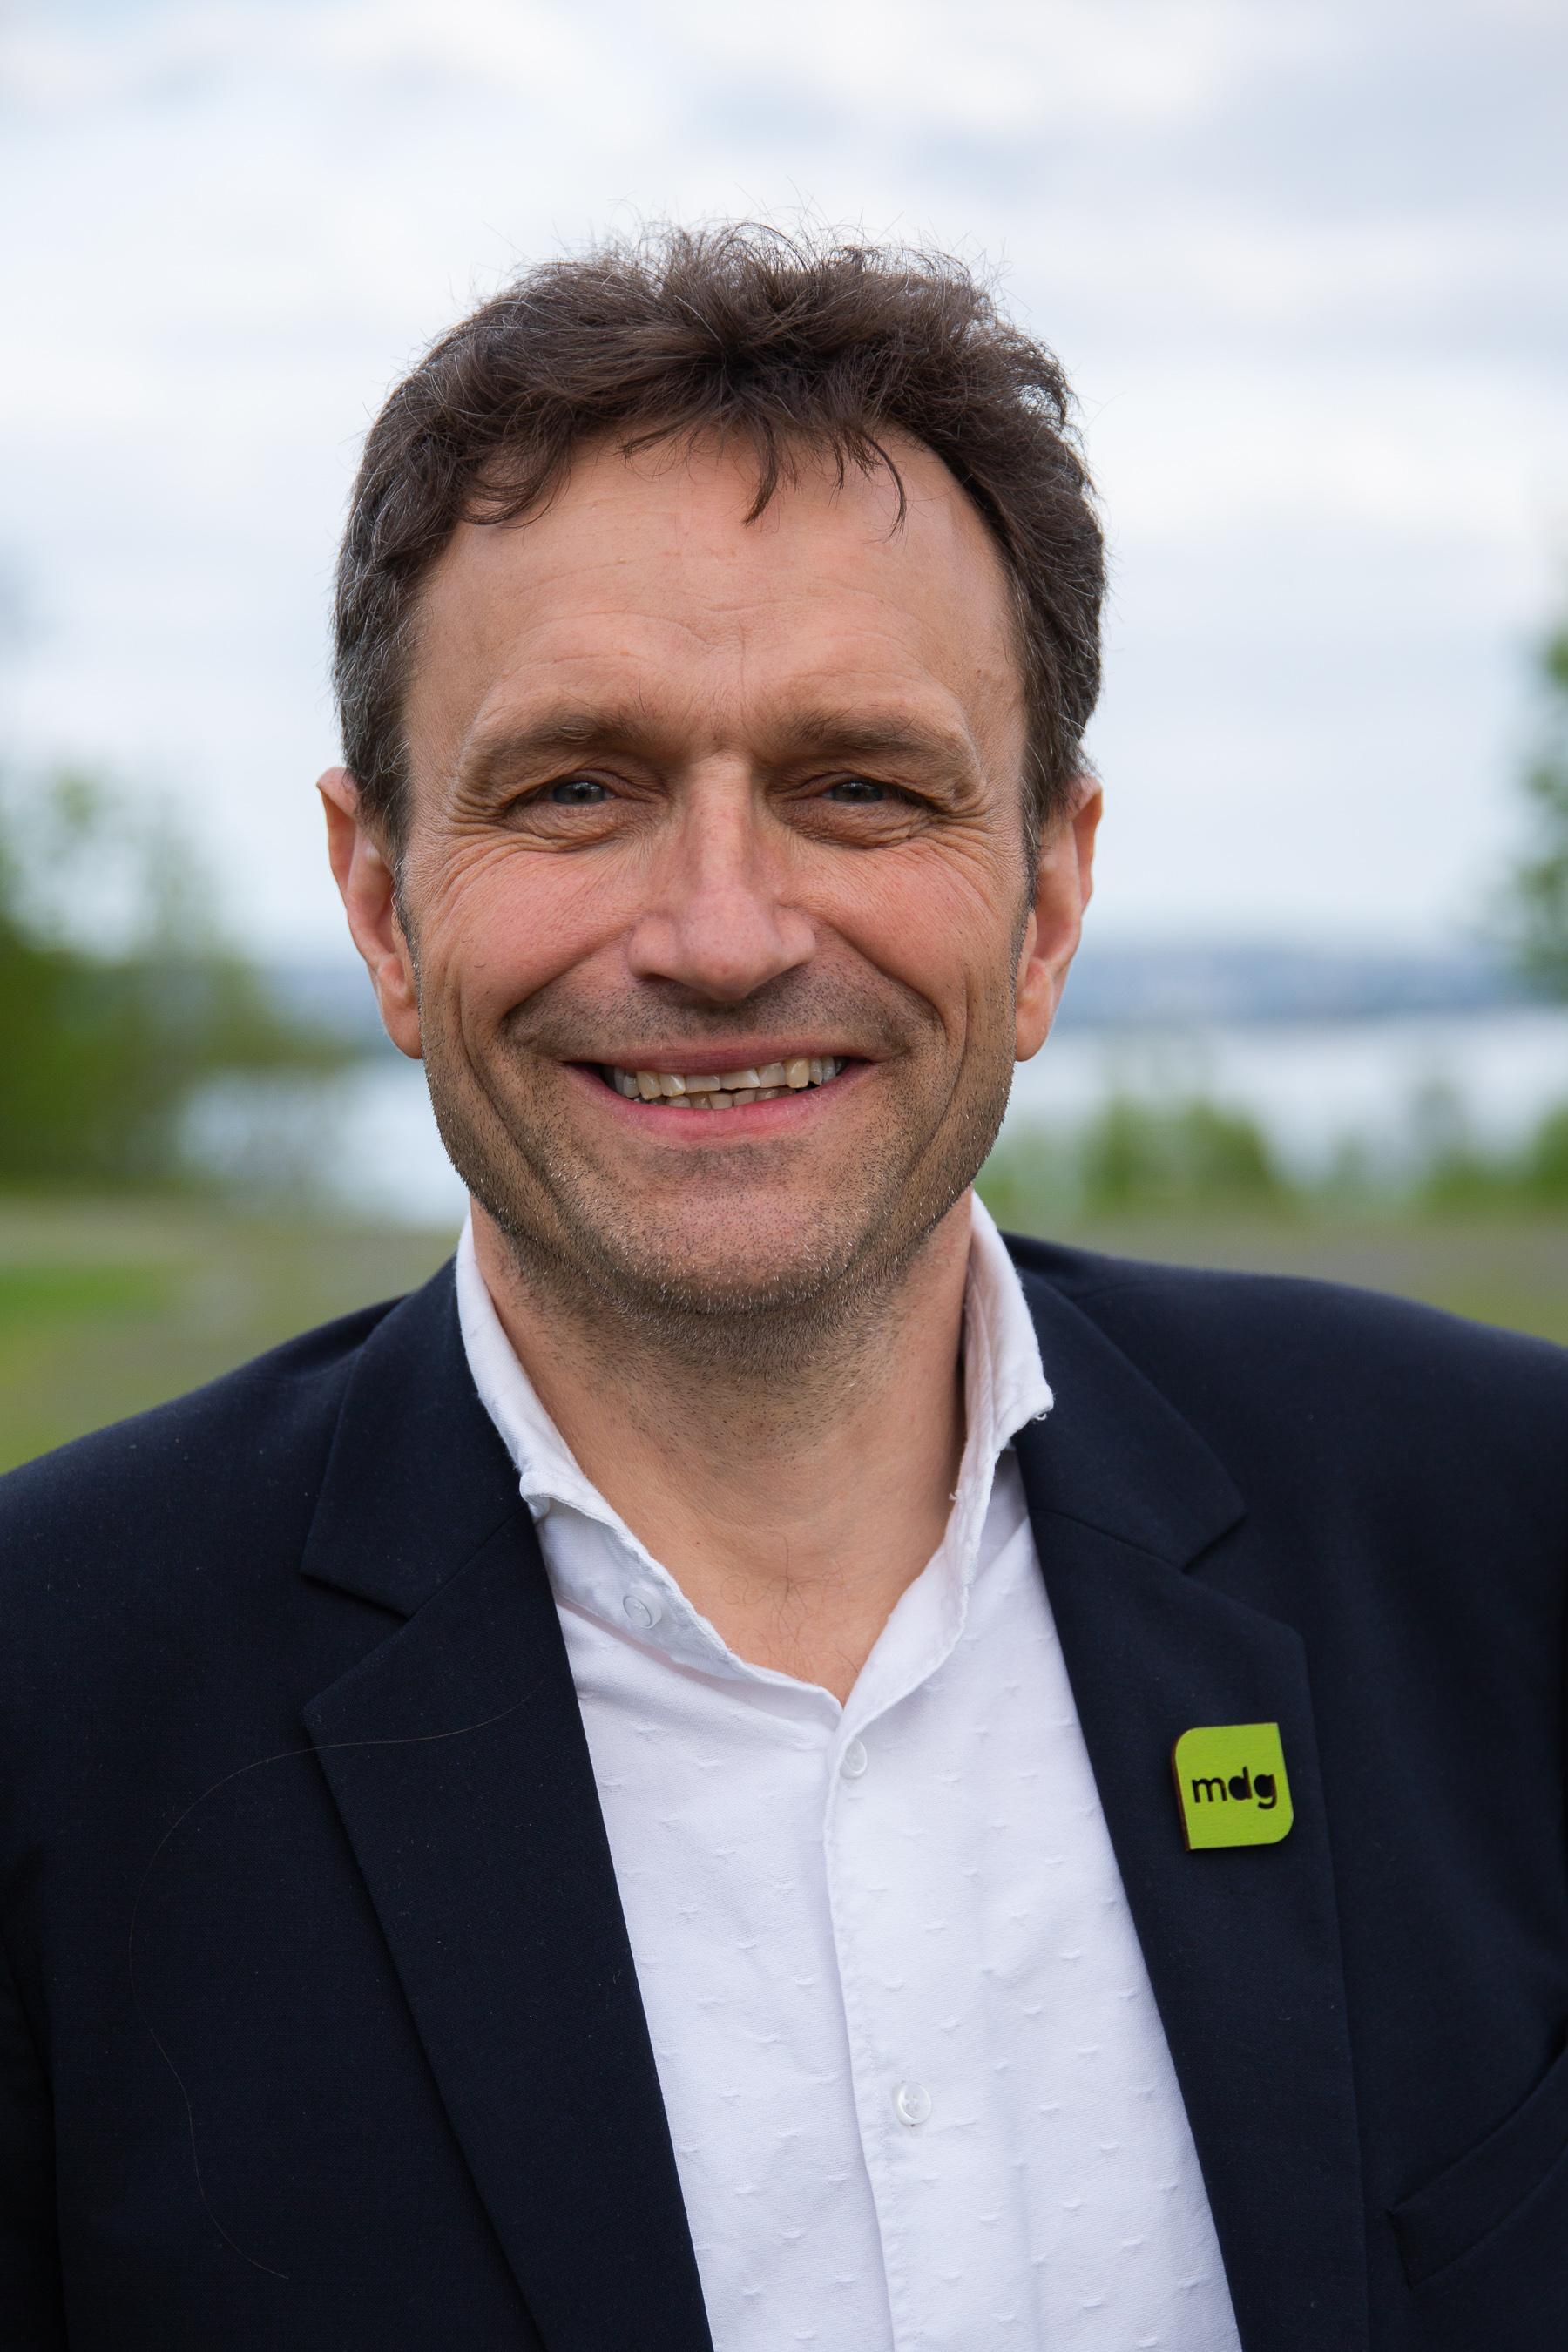 Arild Hermstad. MDG